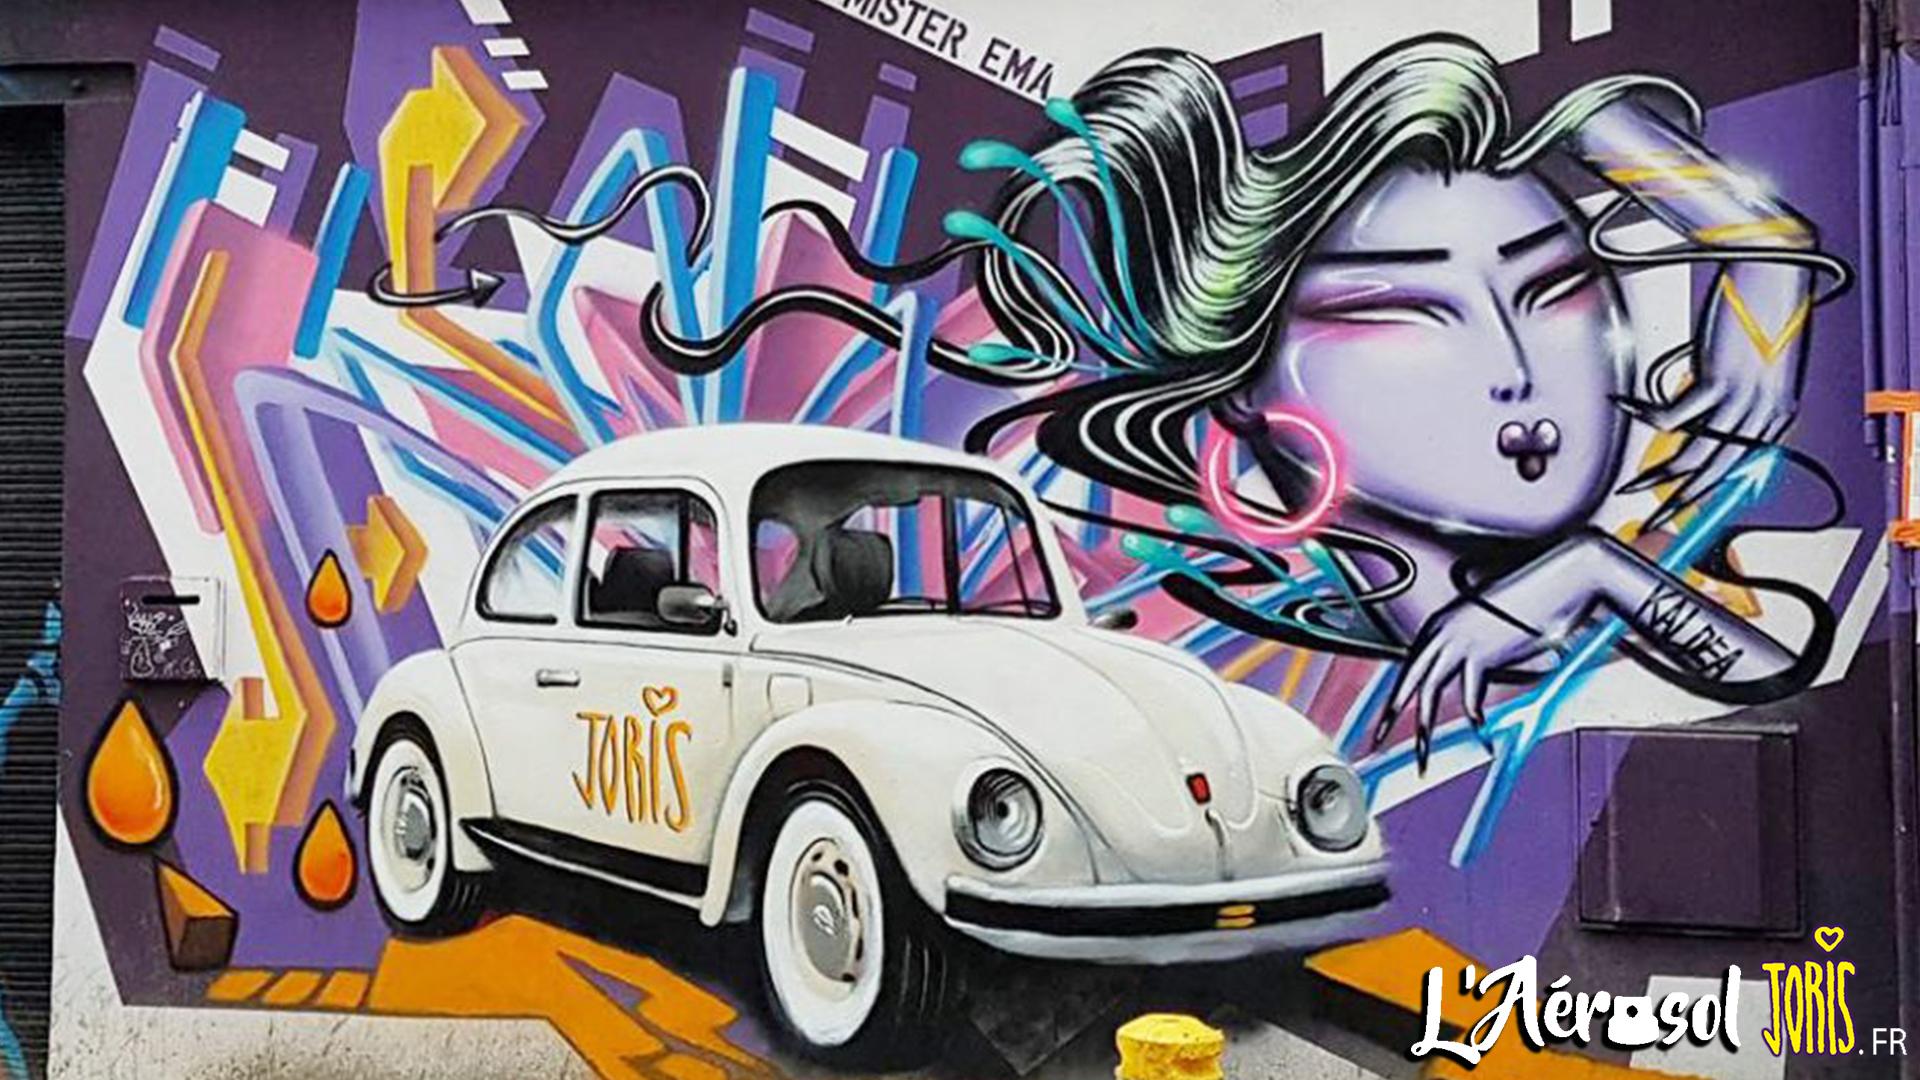 DECORATION-GRAFFITI-FRESQUE-TABLEAU-STREET-ART-PARIS-21